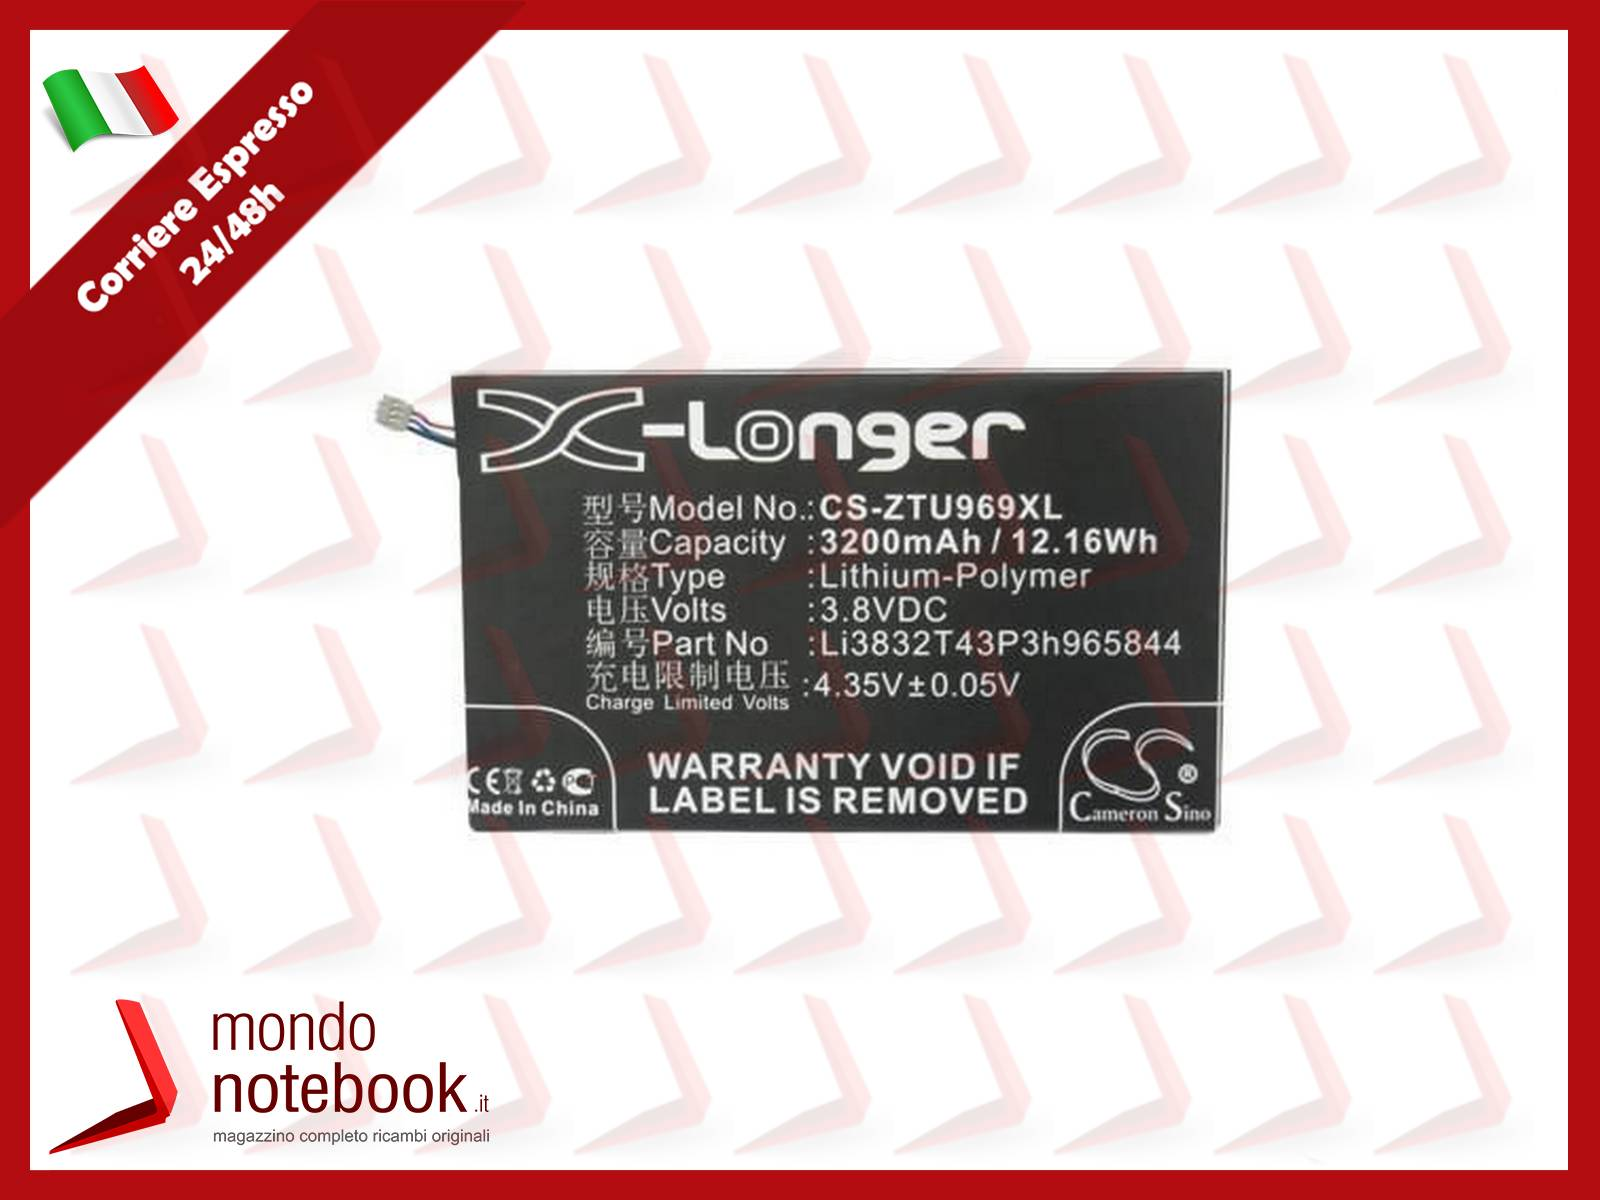 https://www.mondonotebook.it/11882/cavo-lcd-inverter-flex-ribbon-cable-apple-imac-27-a1312-a1311-v-sync-922-9161-2009-2010-593-1049-a.jpg